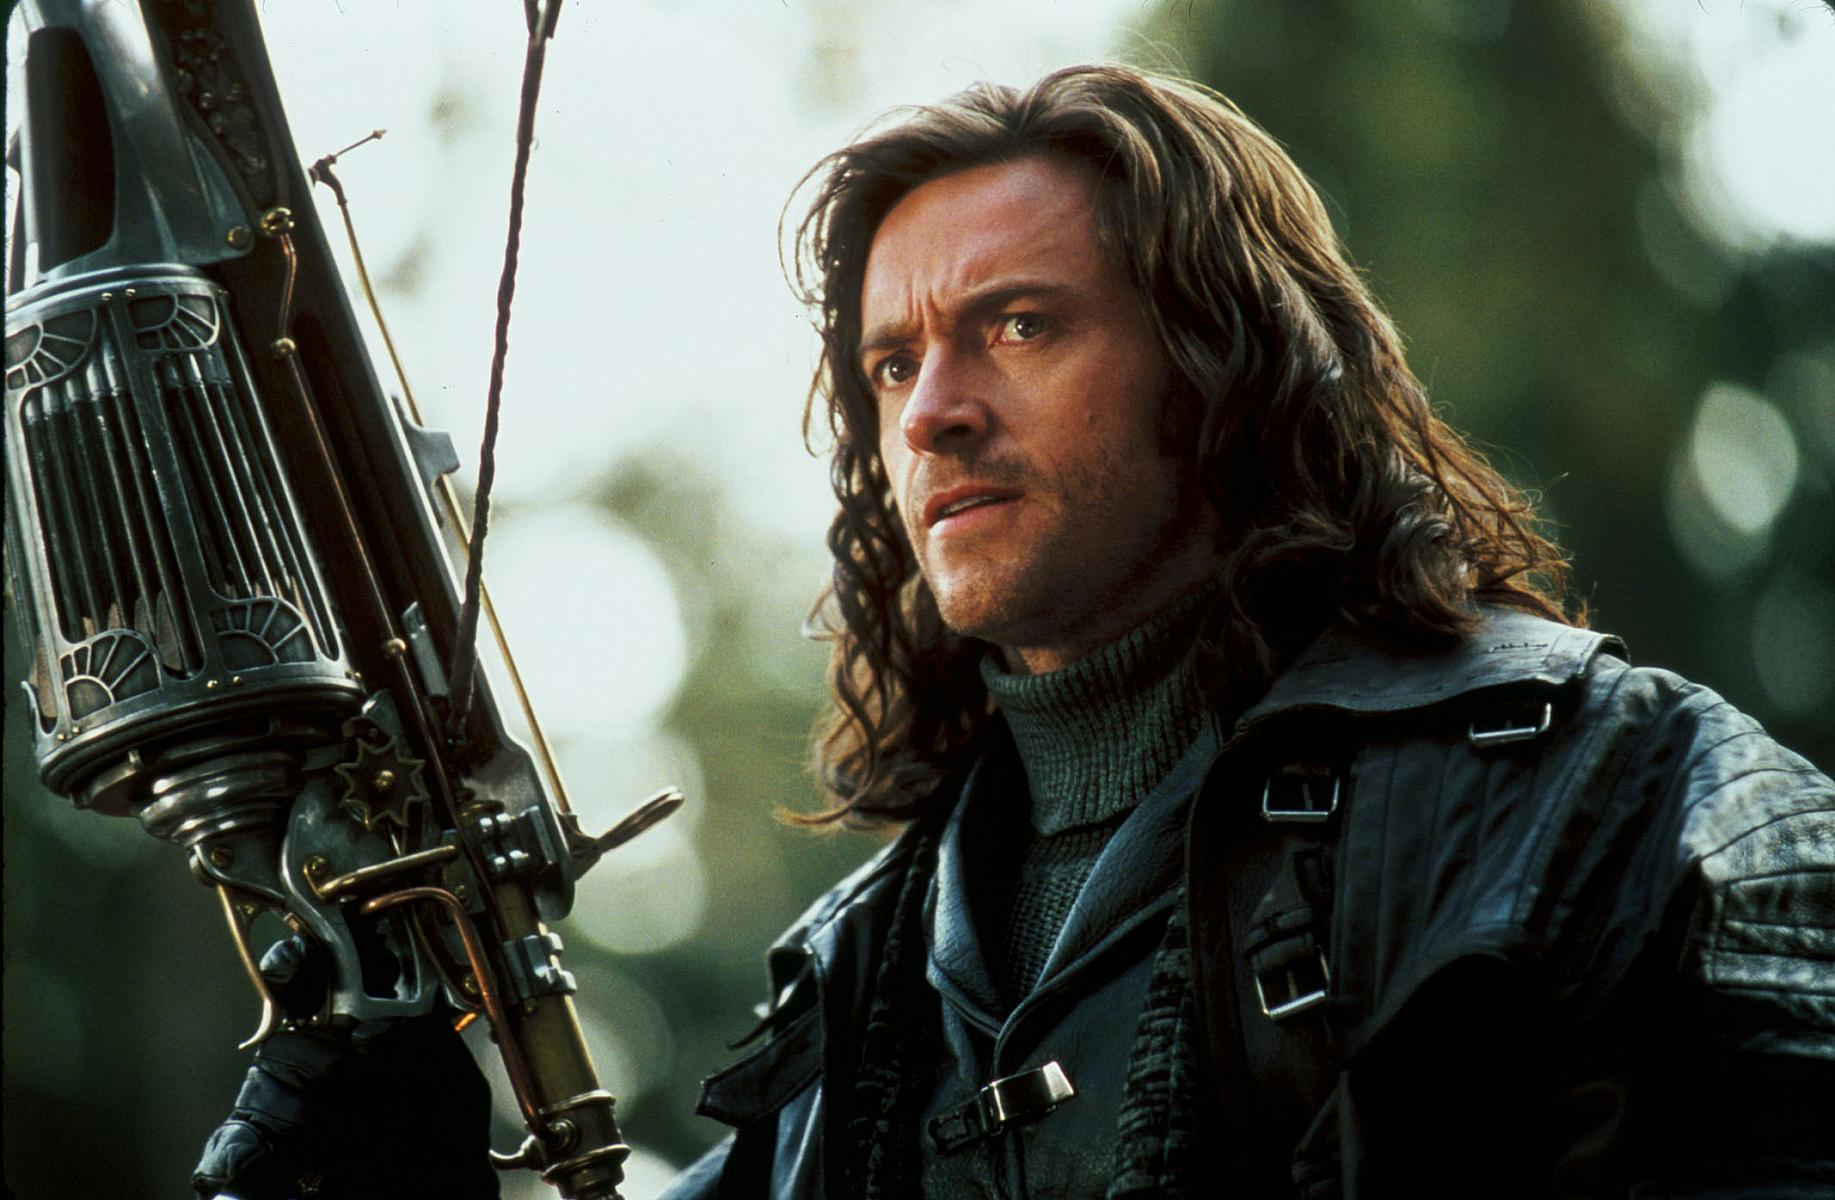 Van Helsing tendrá reboot sin Hugh Jackman | Universal | Drácula | La  República